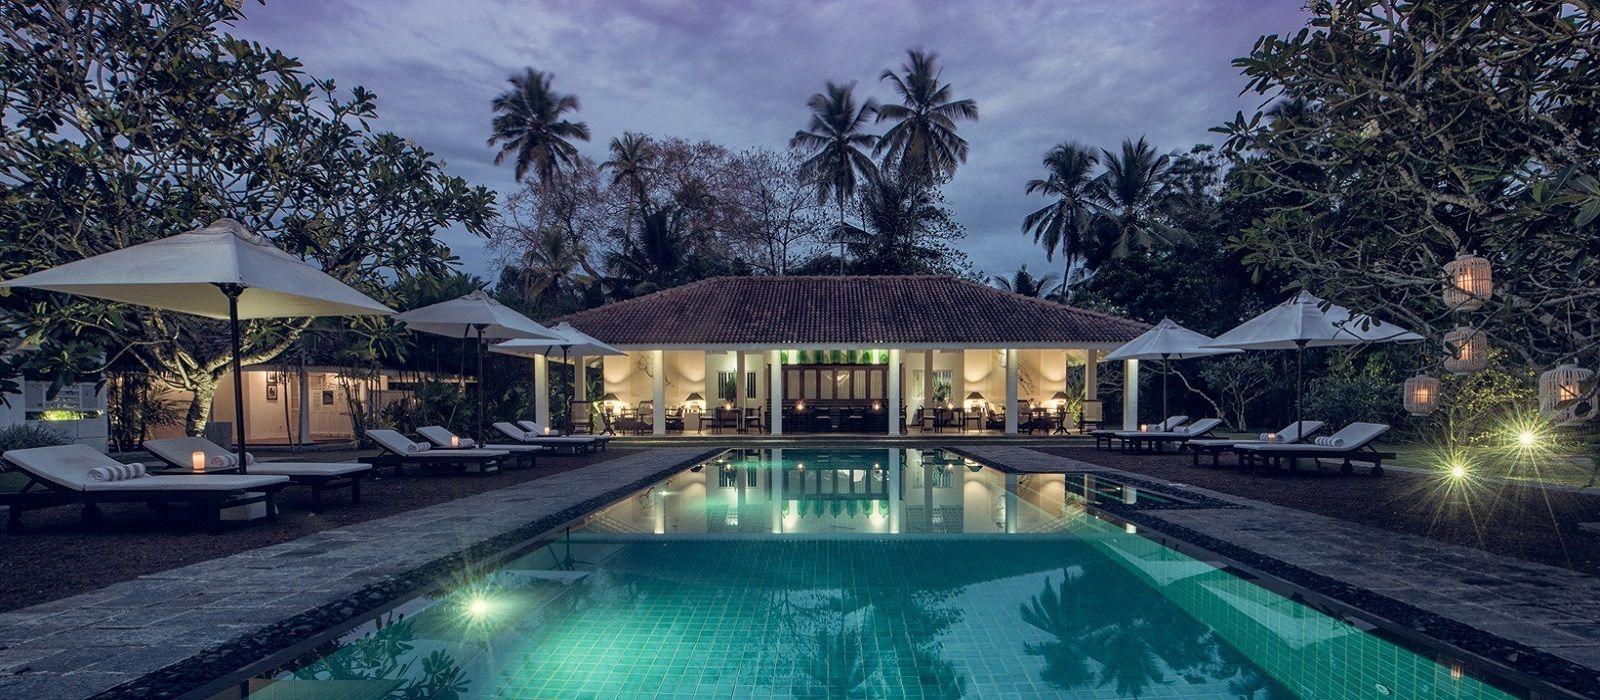 Hotel Taru Villas – Lighthouse Street Sri Lanka